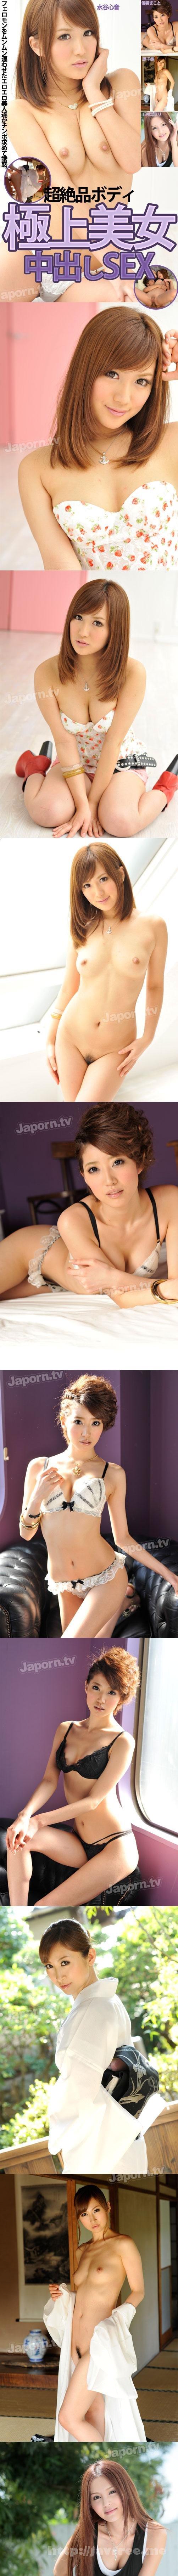 [SMD-181] S Model 181 超絶品ボディ極上美女中出しSEX : 優希まこと, 水谷心音, 原千尋, 丘咲エミリ - image SMD-181_1 on https://javfree.me